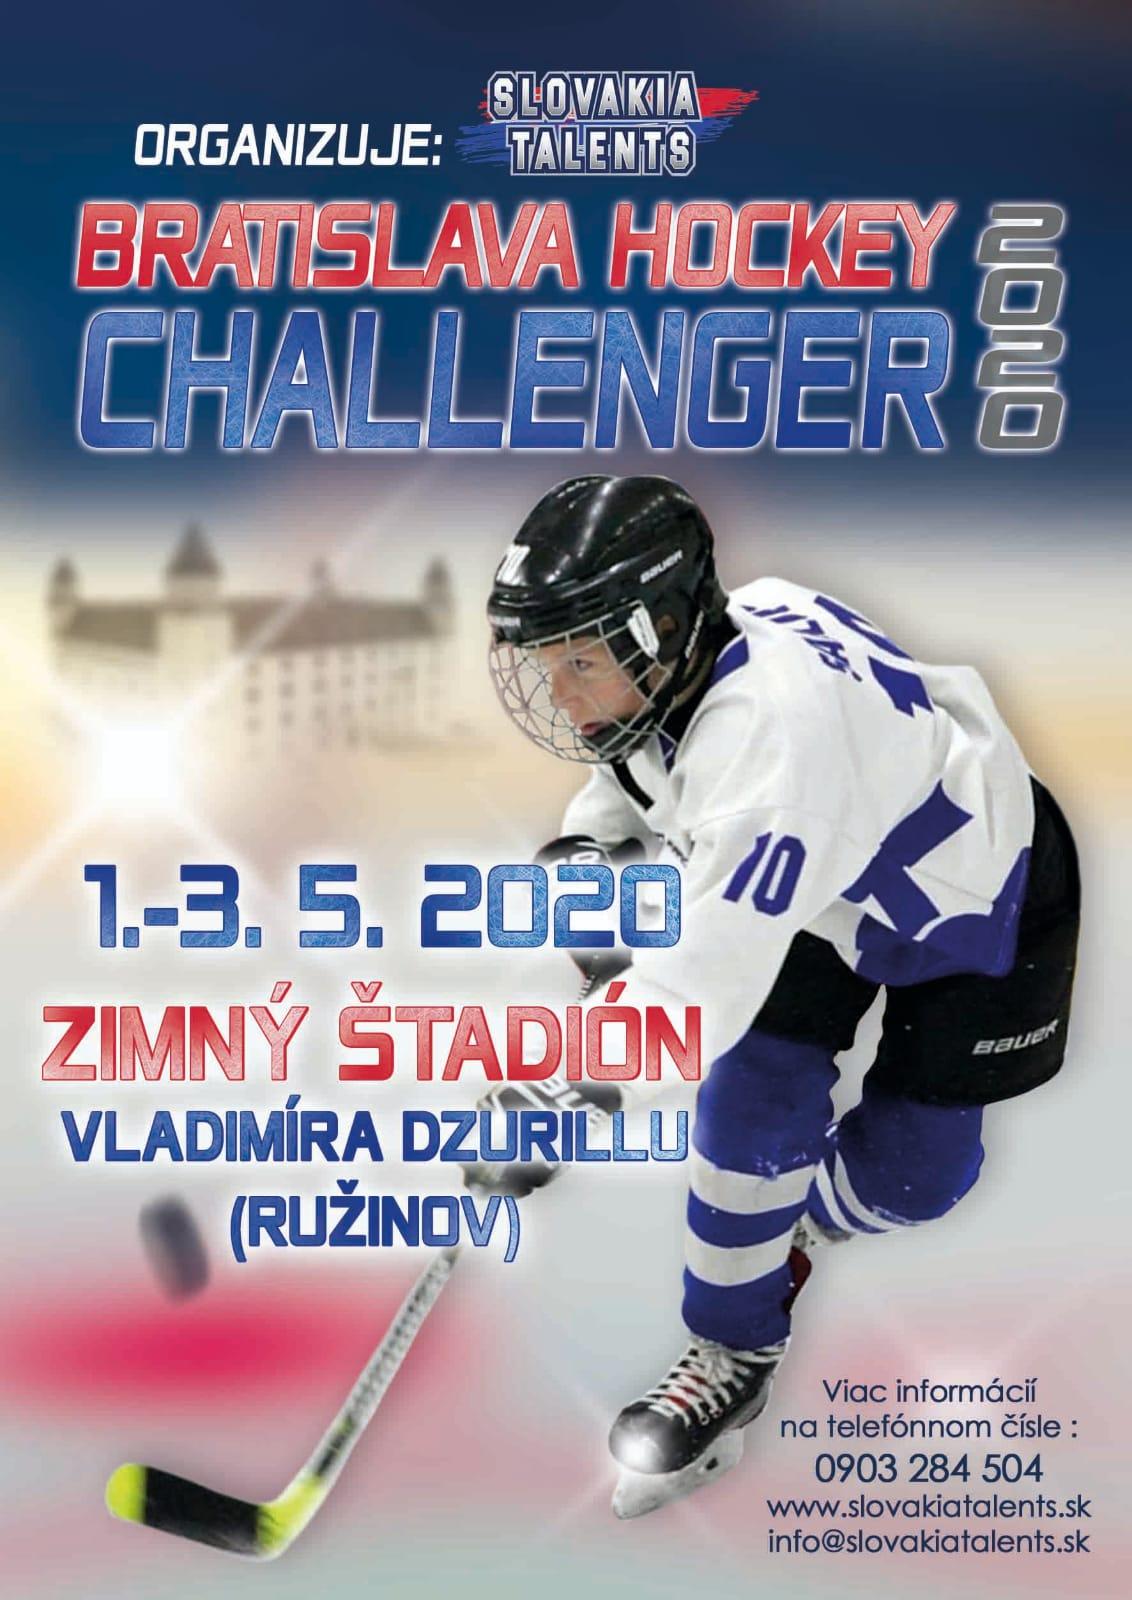 Bratislava Hockey Challenger 2010